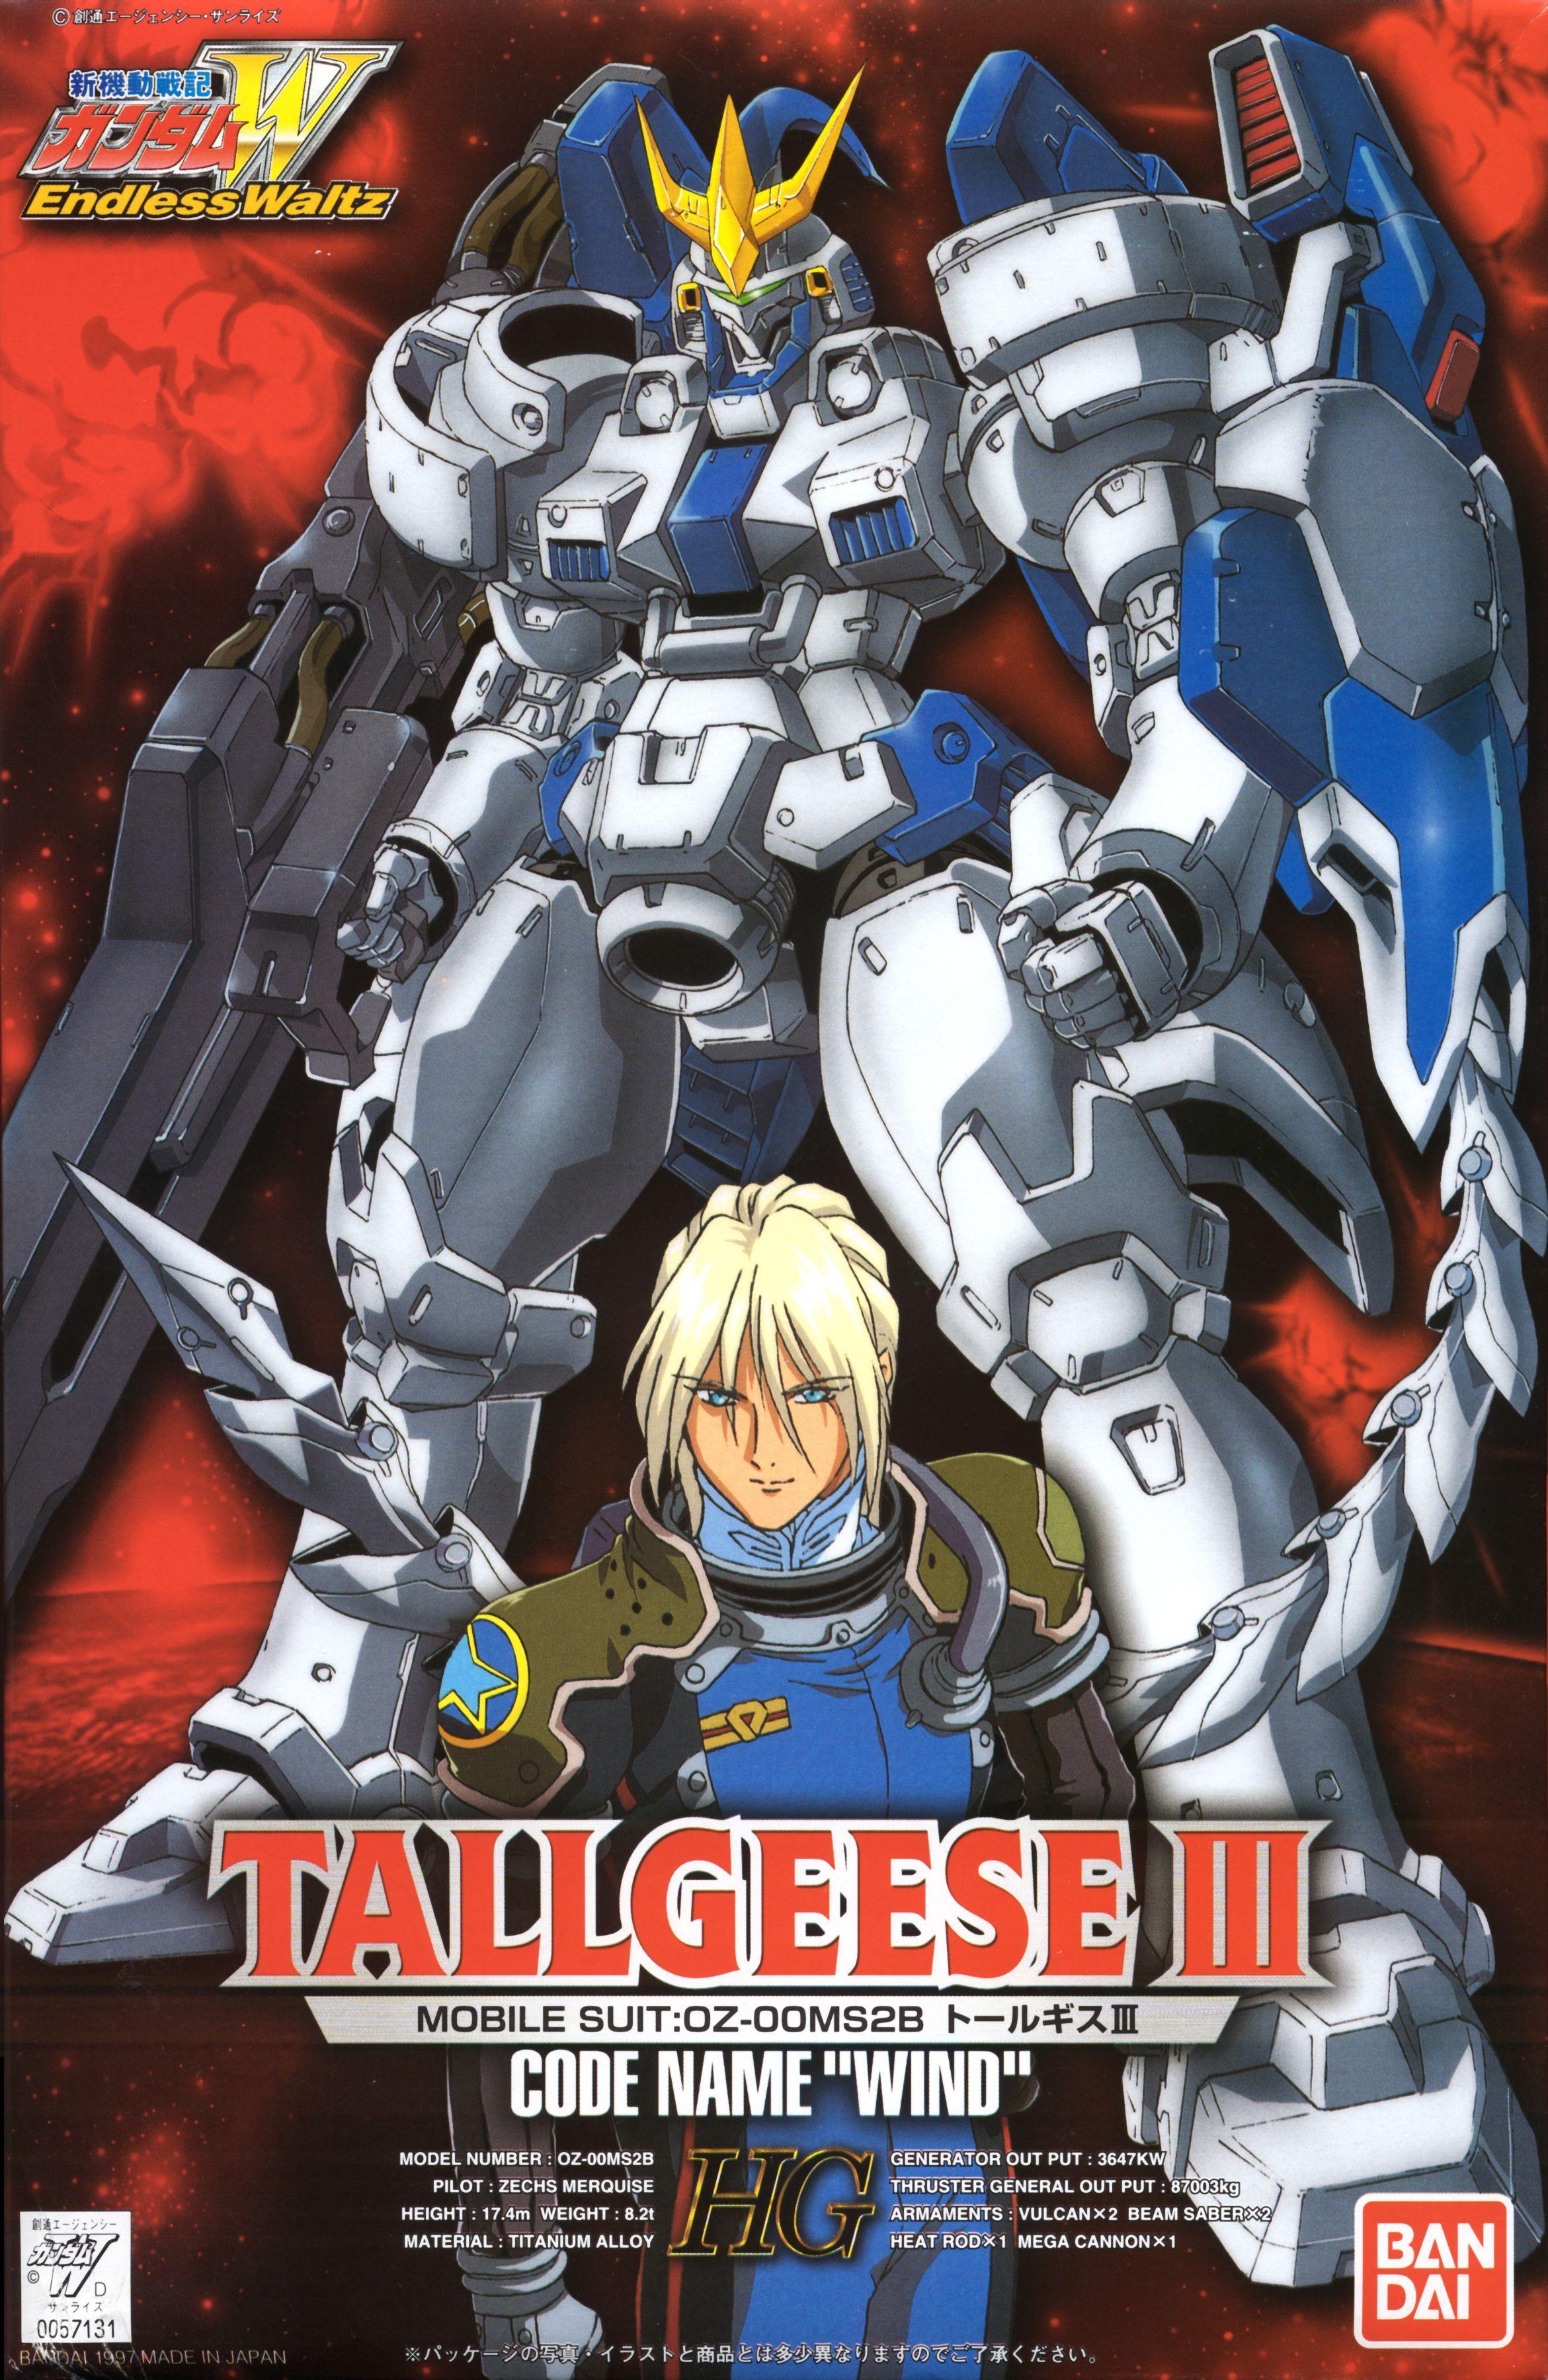 HG 1/100 TALLGEESE III (EW)